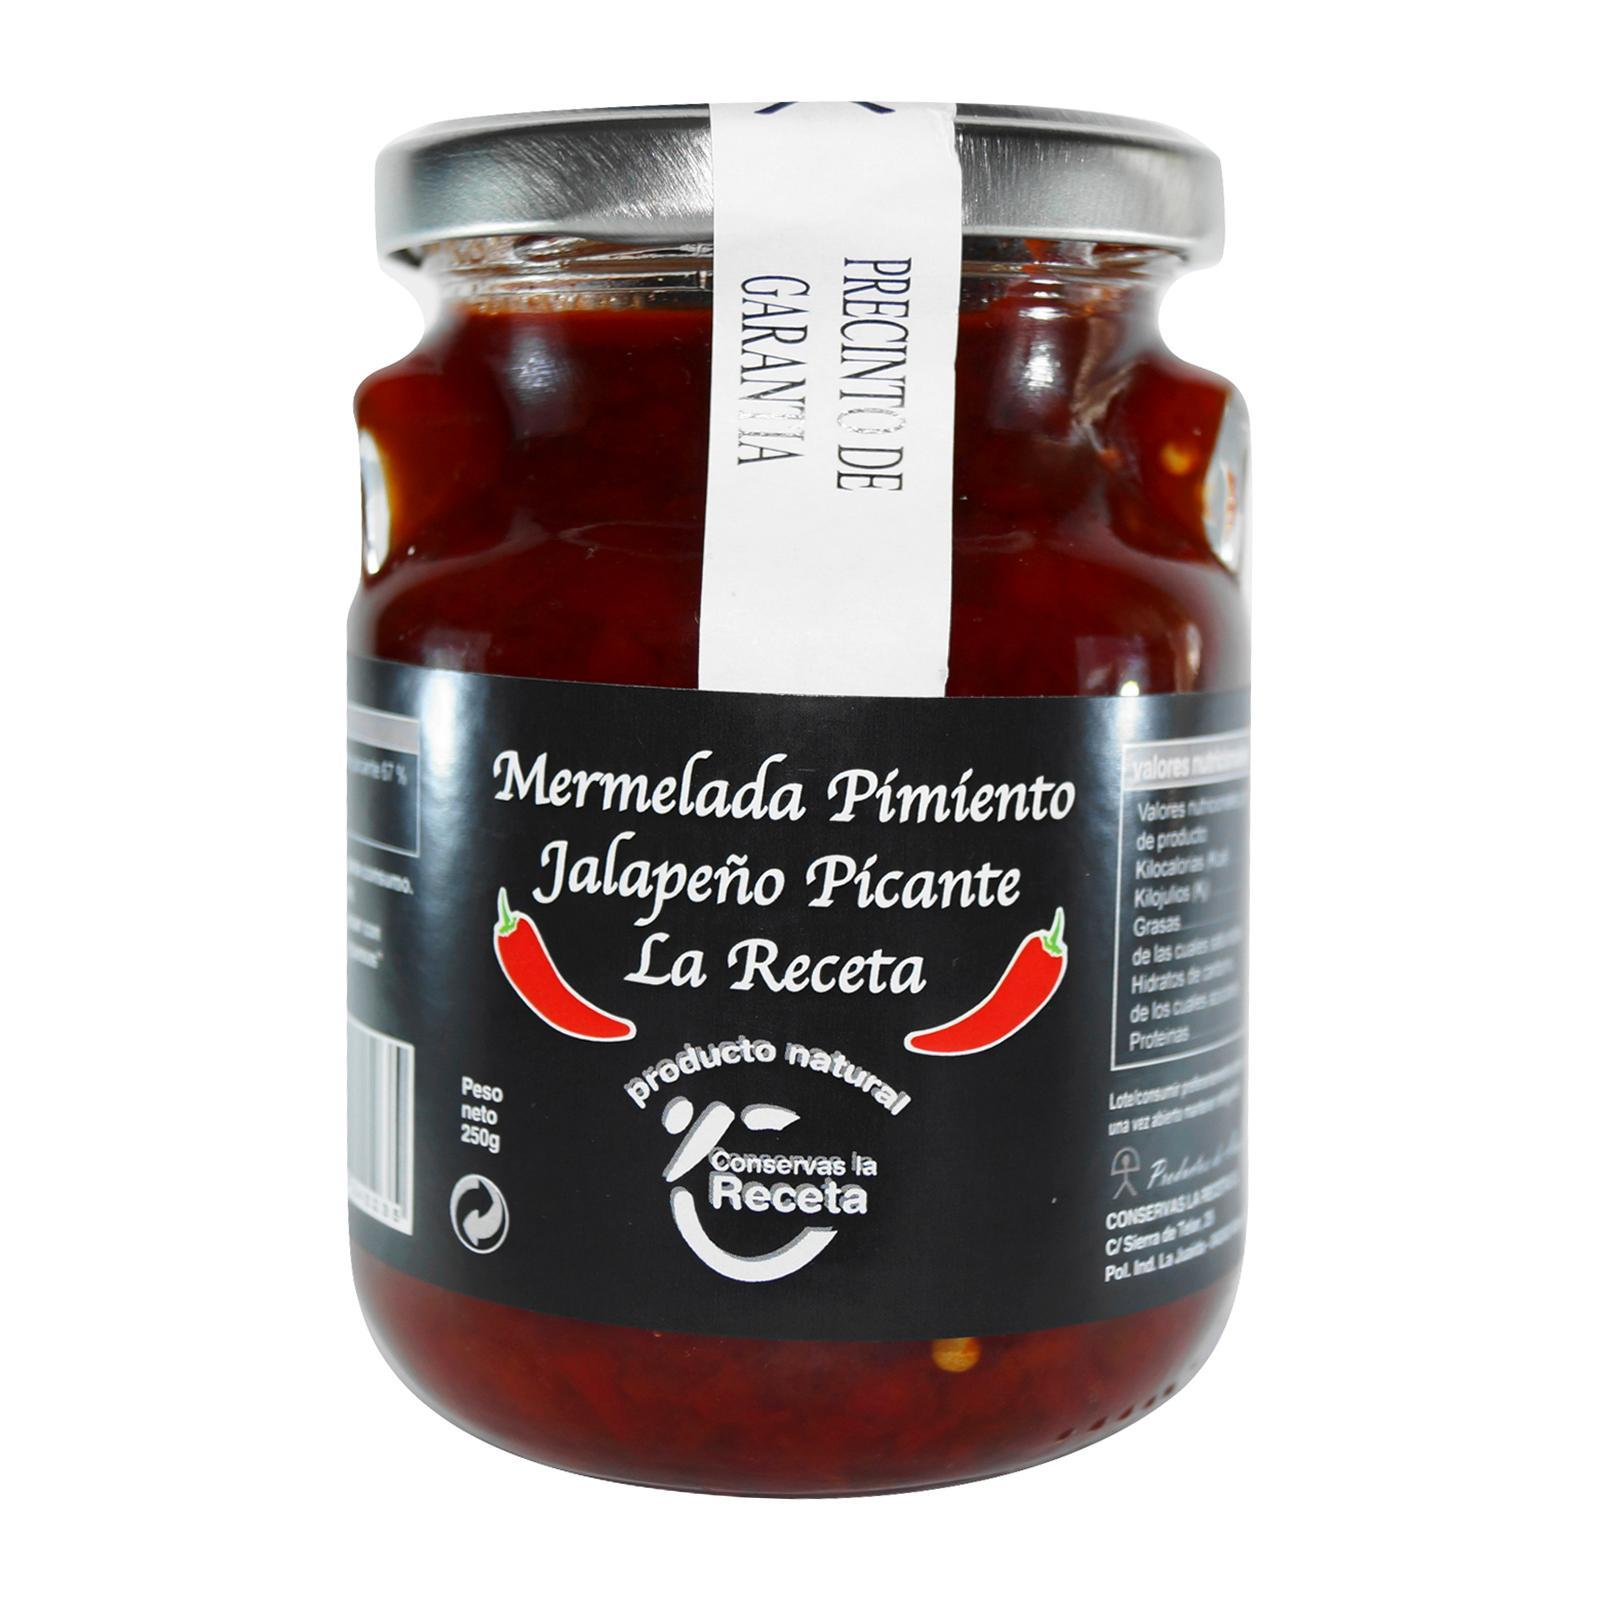 La Receta Spicy Jalapeno Peppers Jams